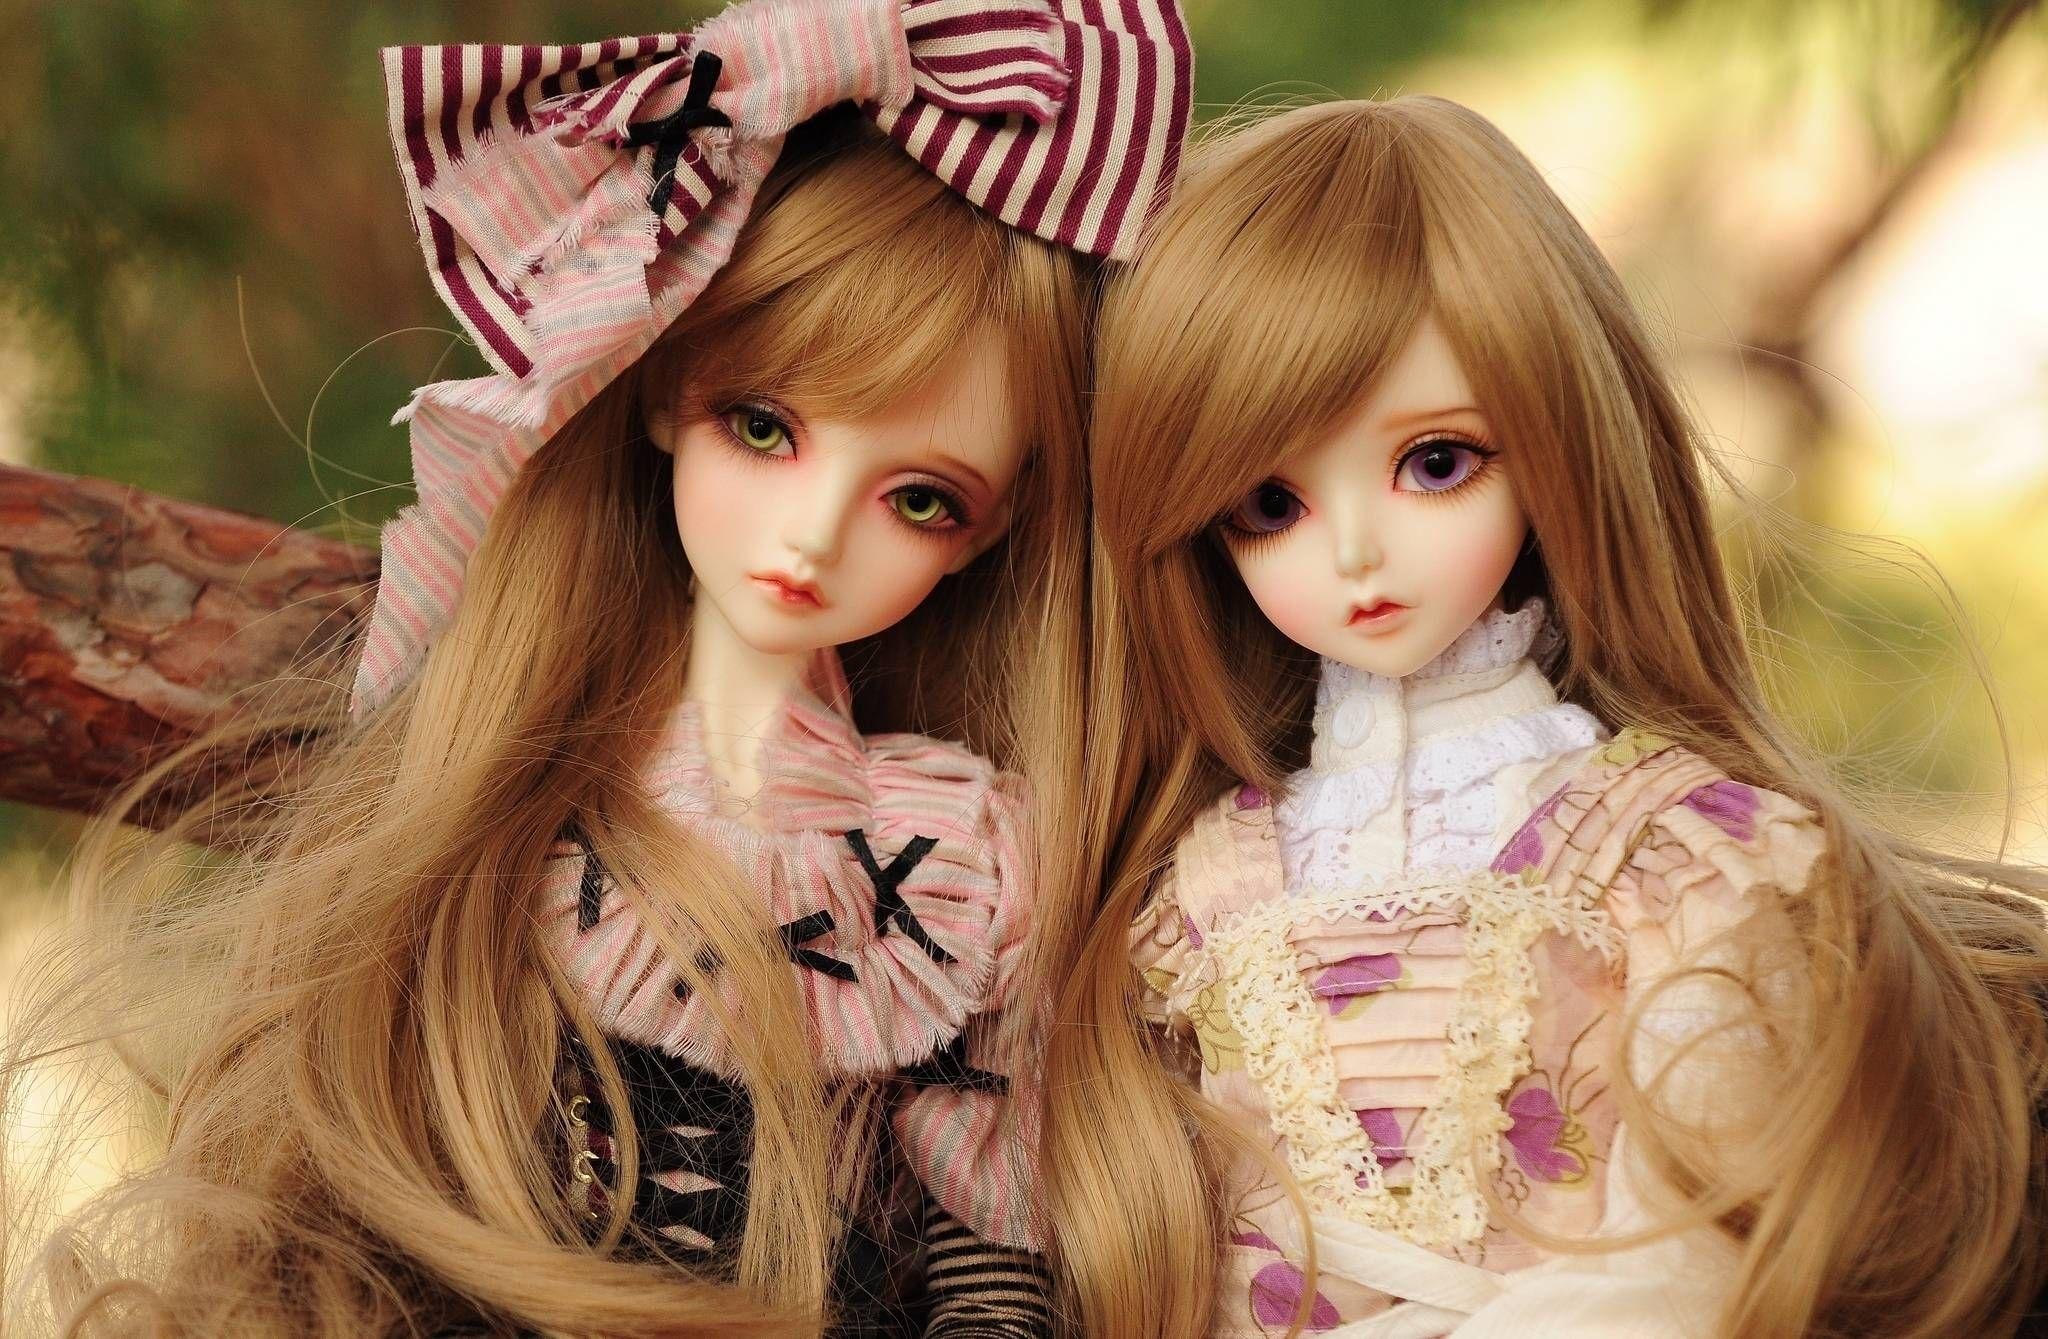 Beautiful Barbie Doll Hd Wallpapers Free Download Best Photos 630 935 Barbie Doll Wallpapers 32 Wallpap Doll Images Hd Beautiful Barbie Dolls Beautiful Dolls